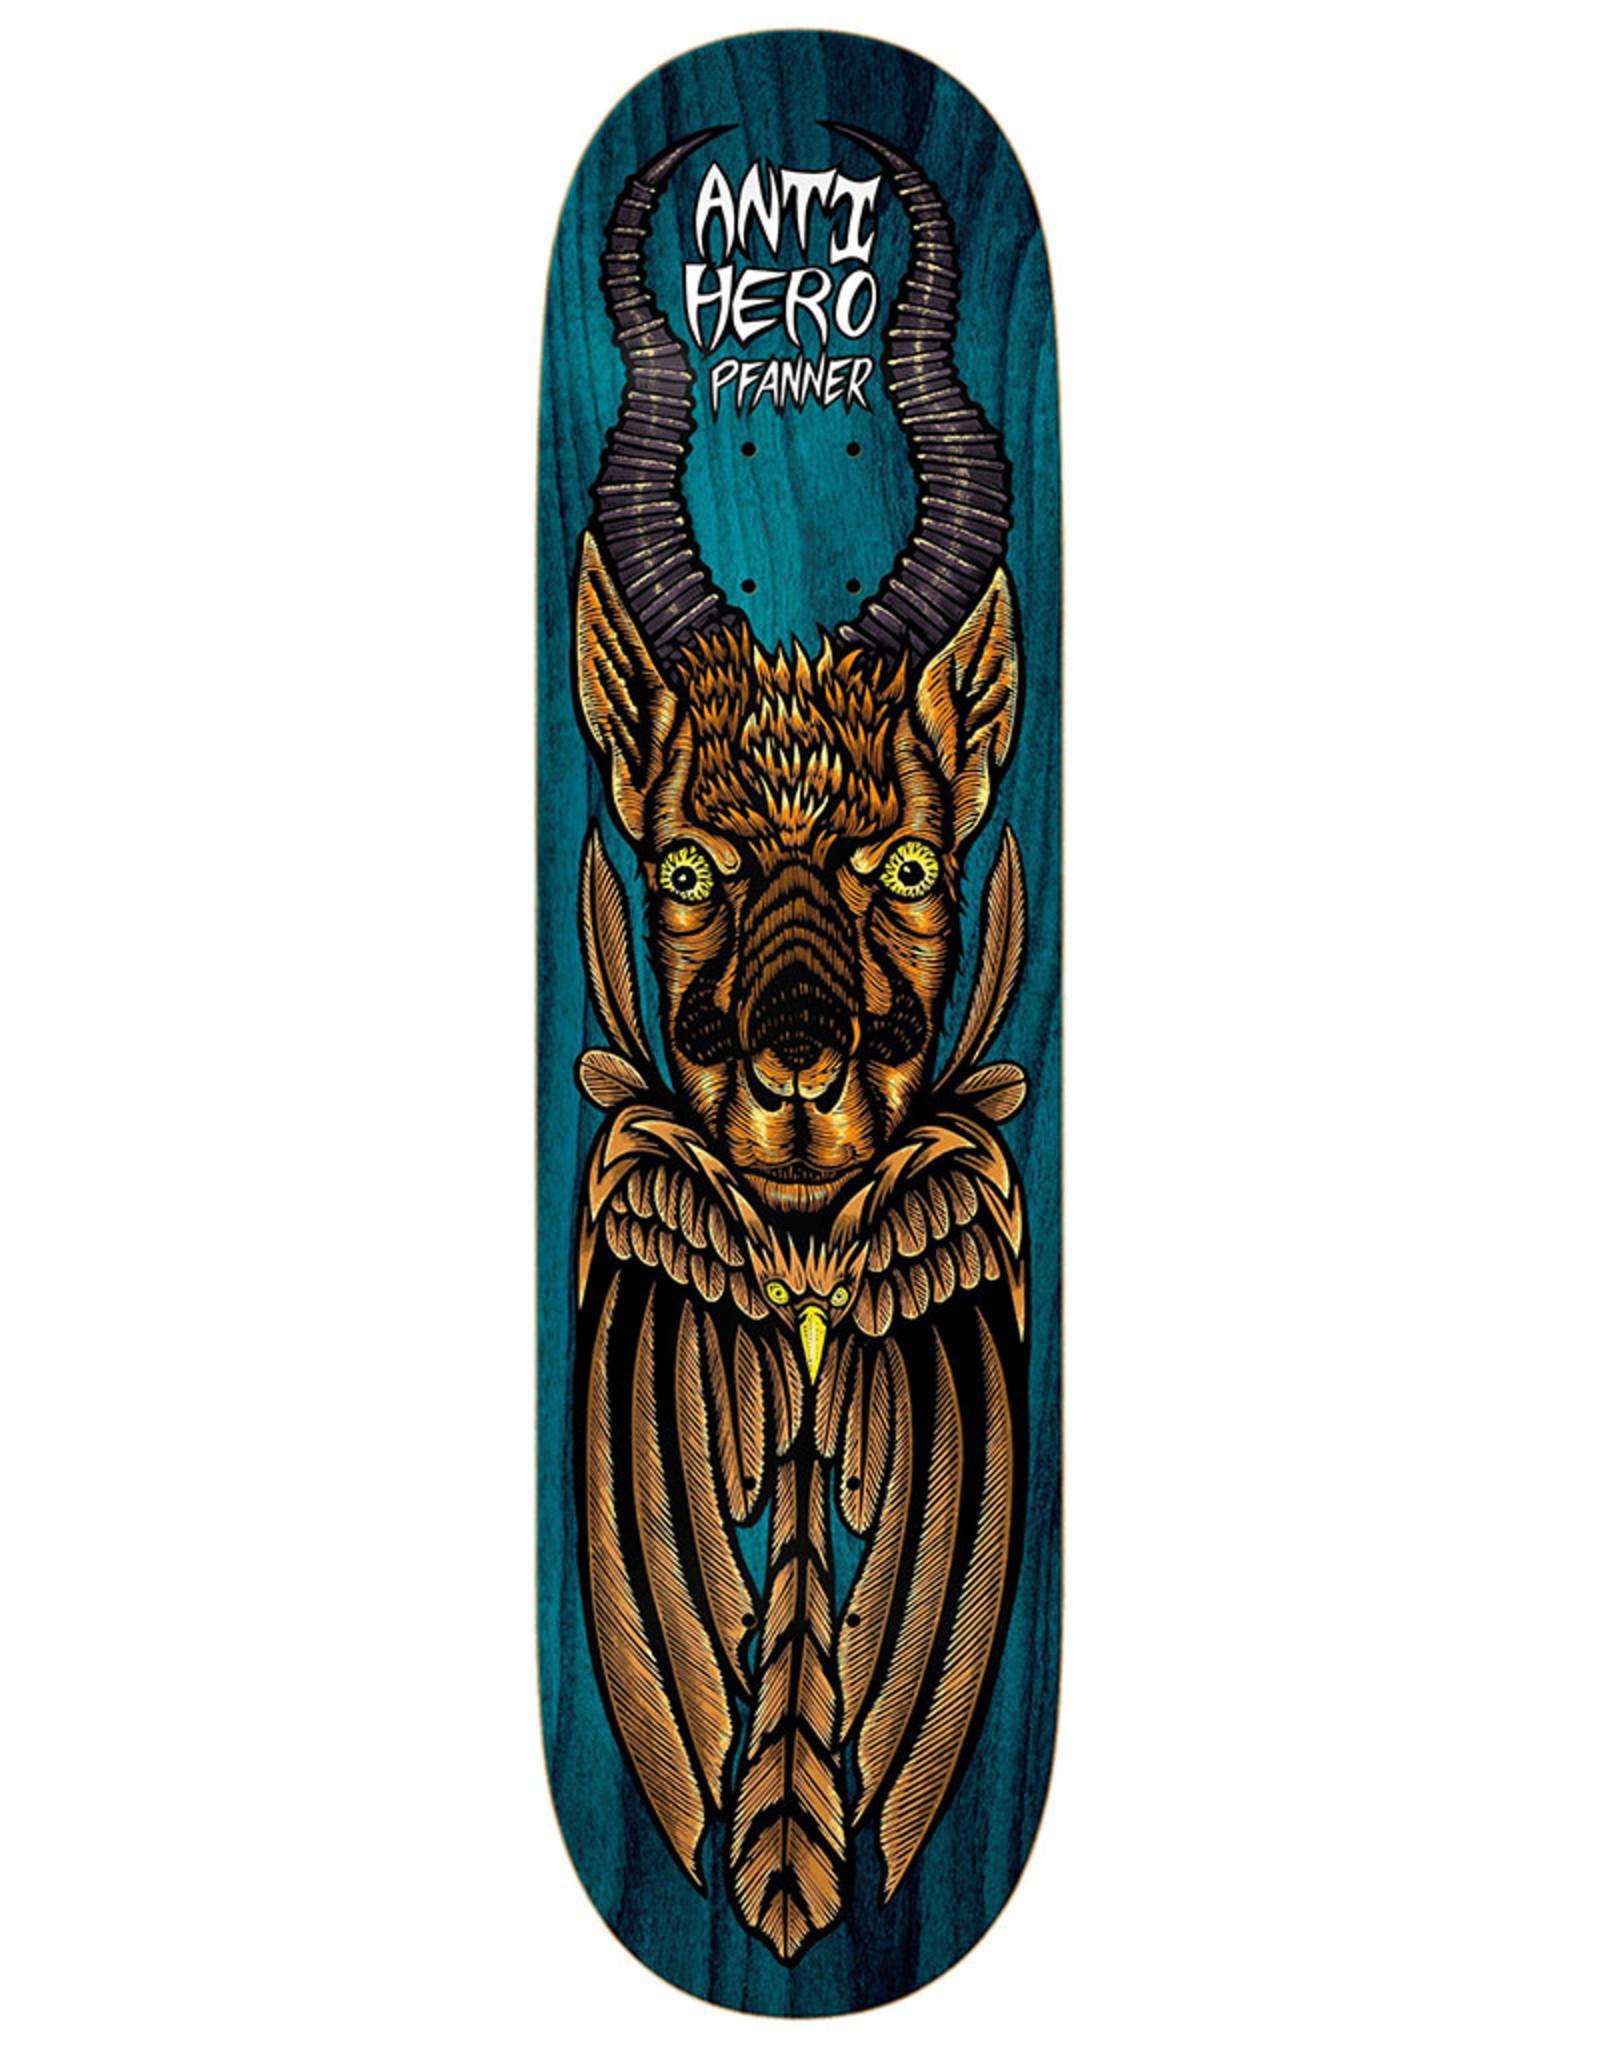 Anti Hero Anti Hero Deck Chris Pfanner Totem (8.25)